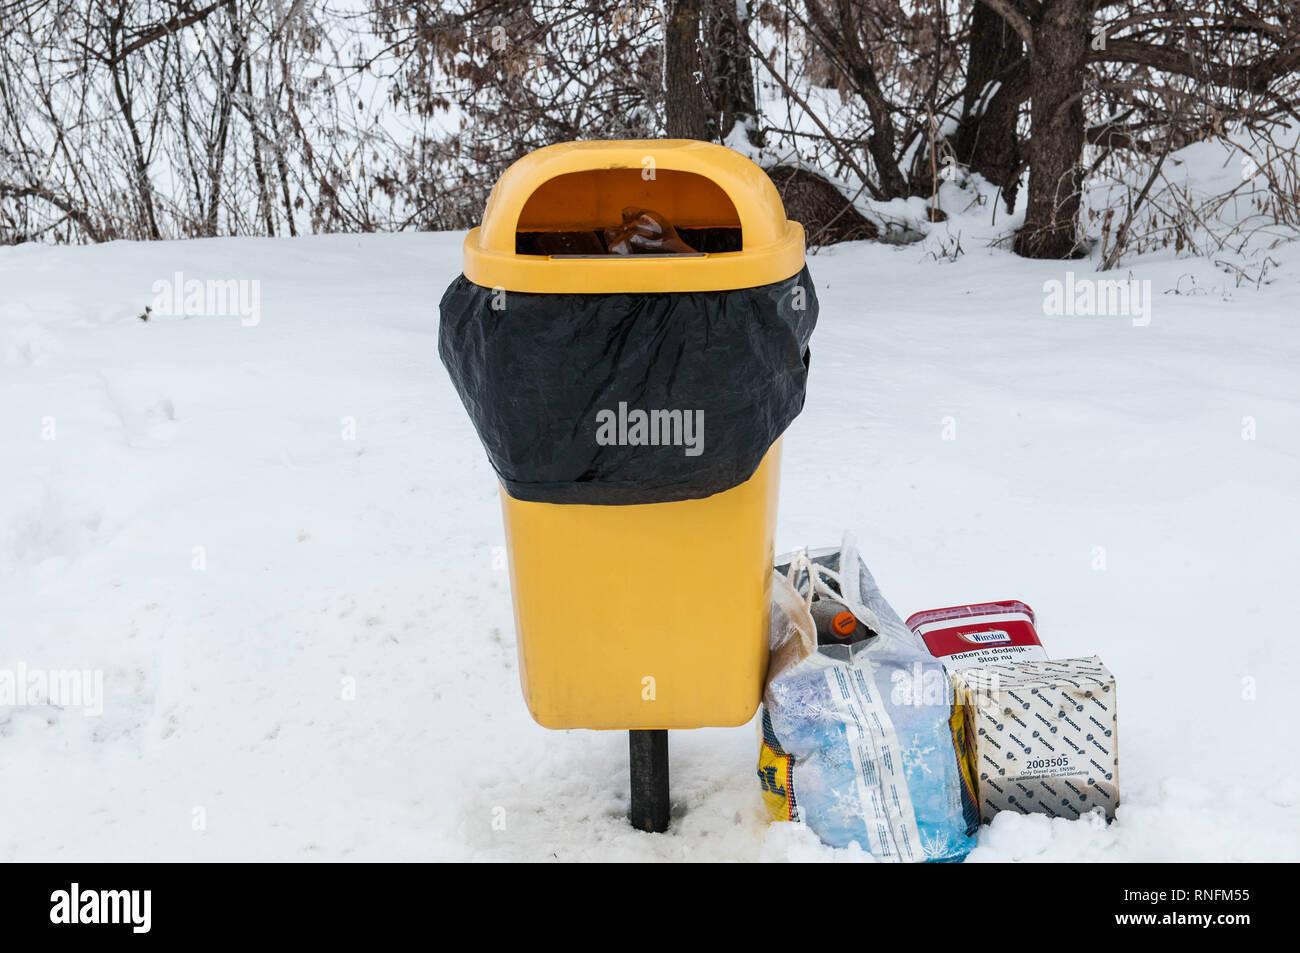 A full trashbin near roadside, plastic bags filled with trash - Stock Image